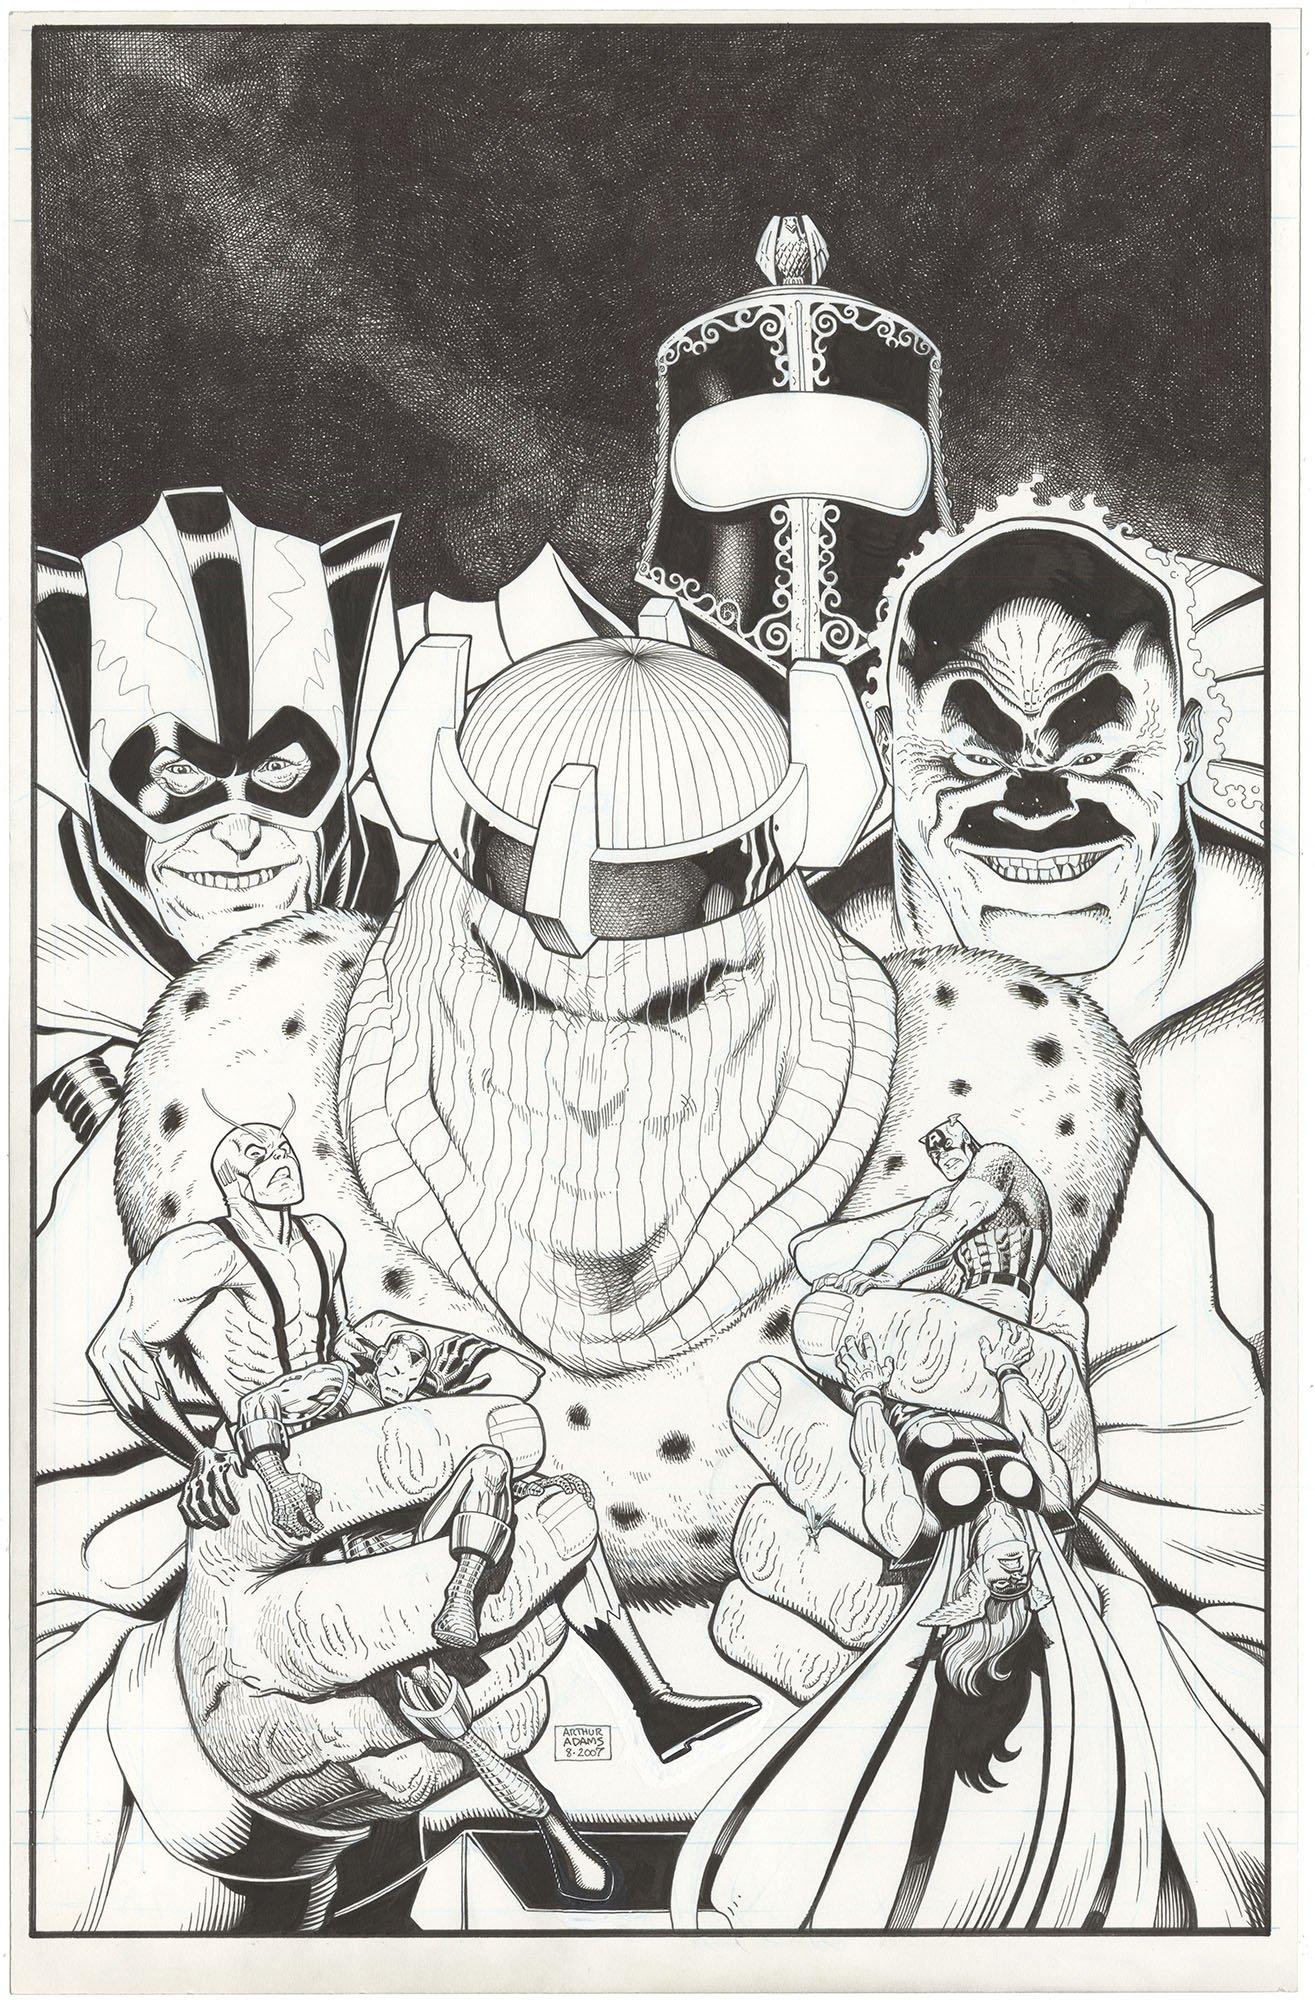 Avengers Classic #6 Cover (Large Art)